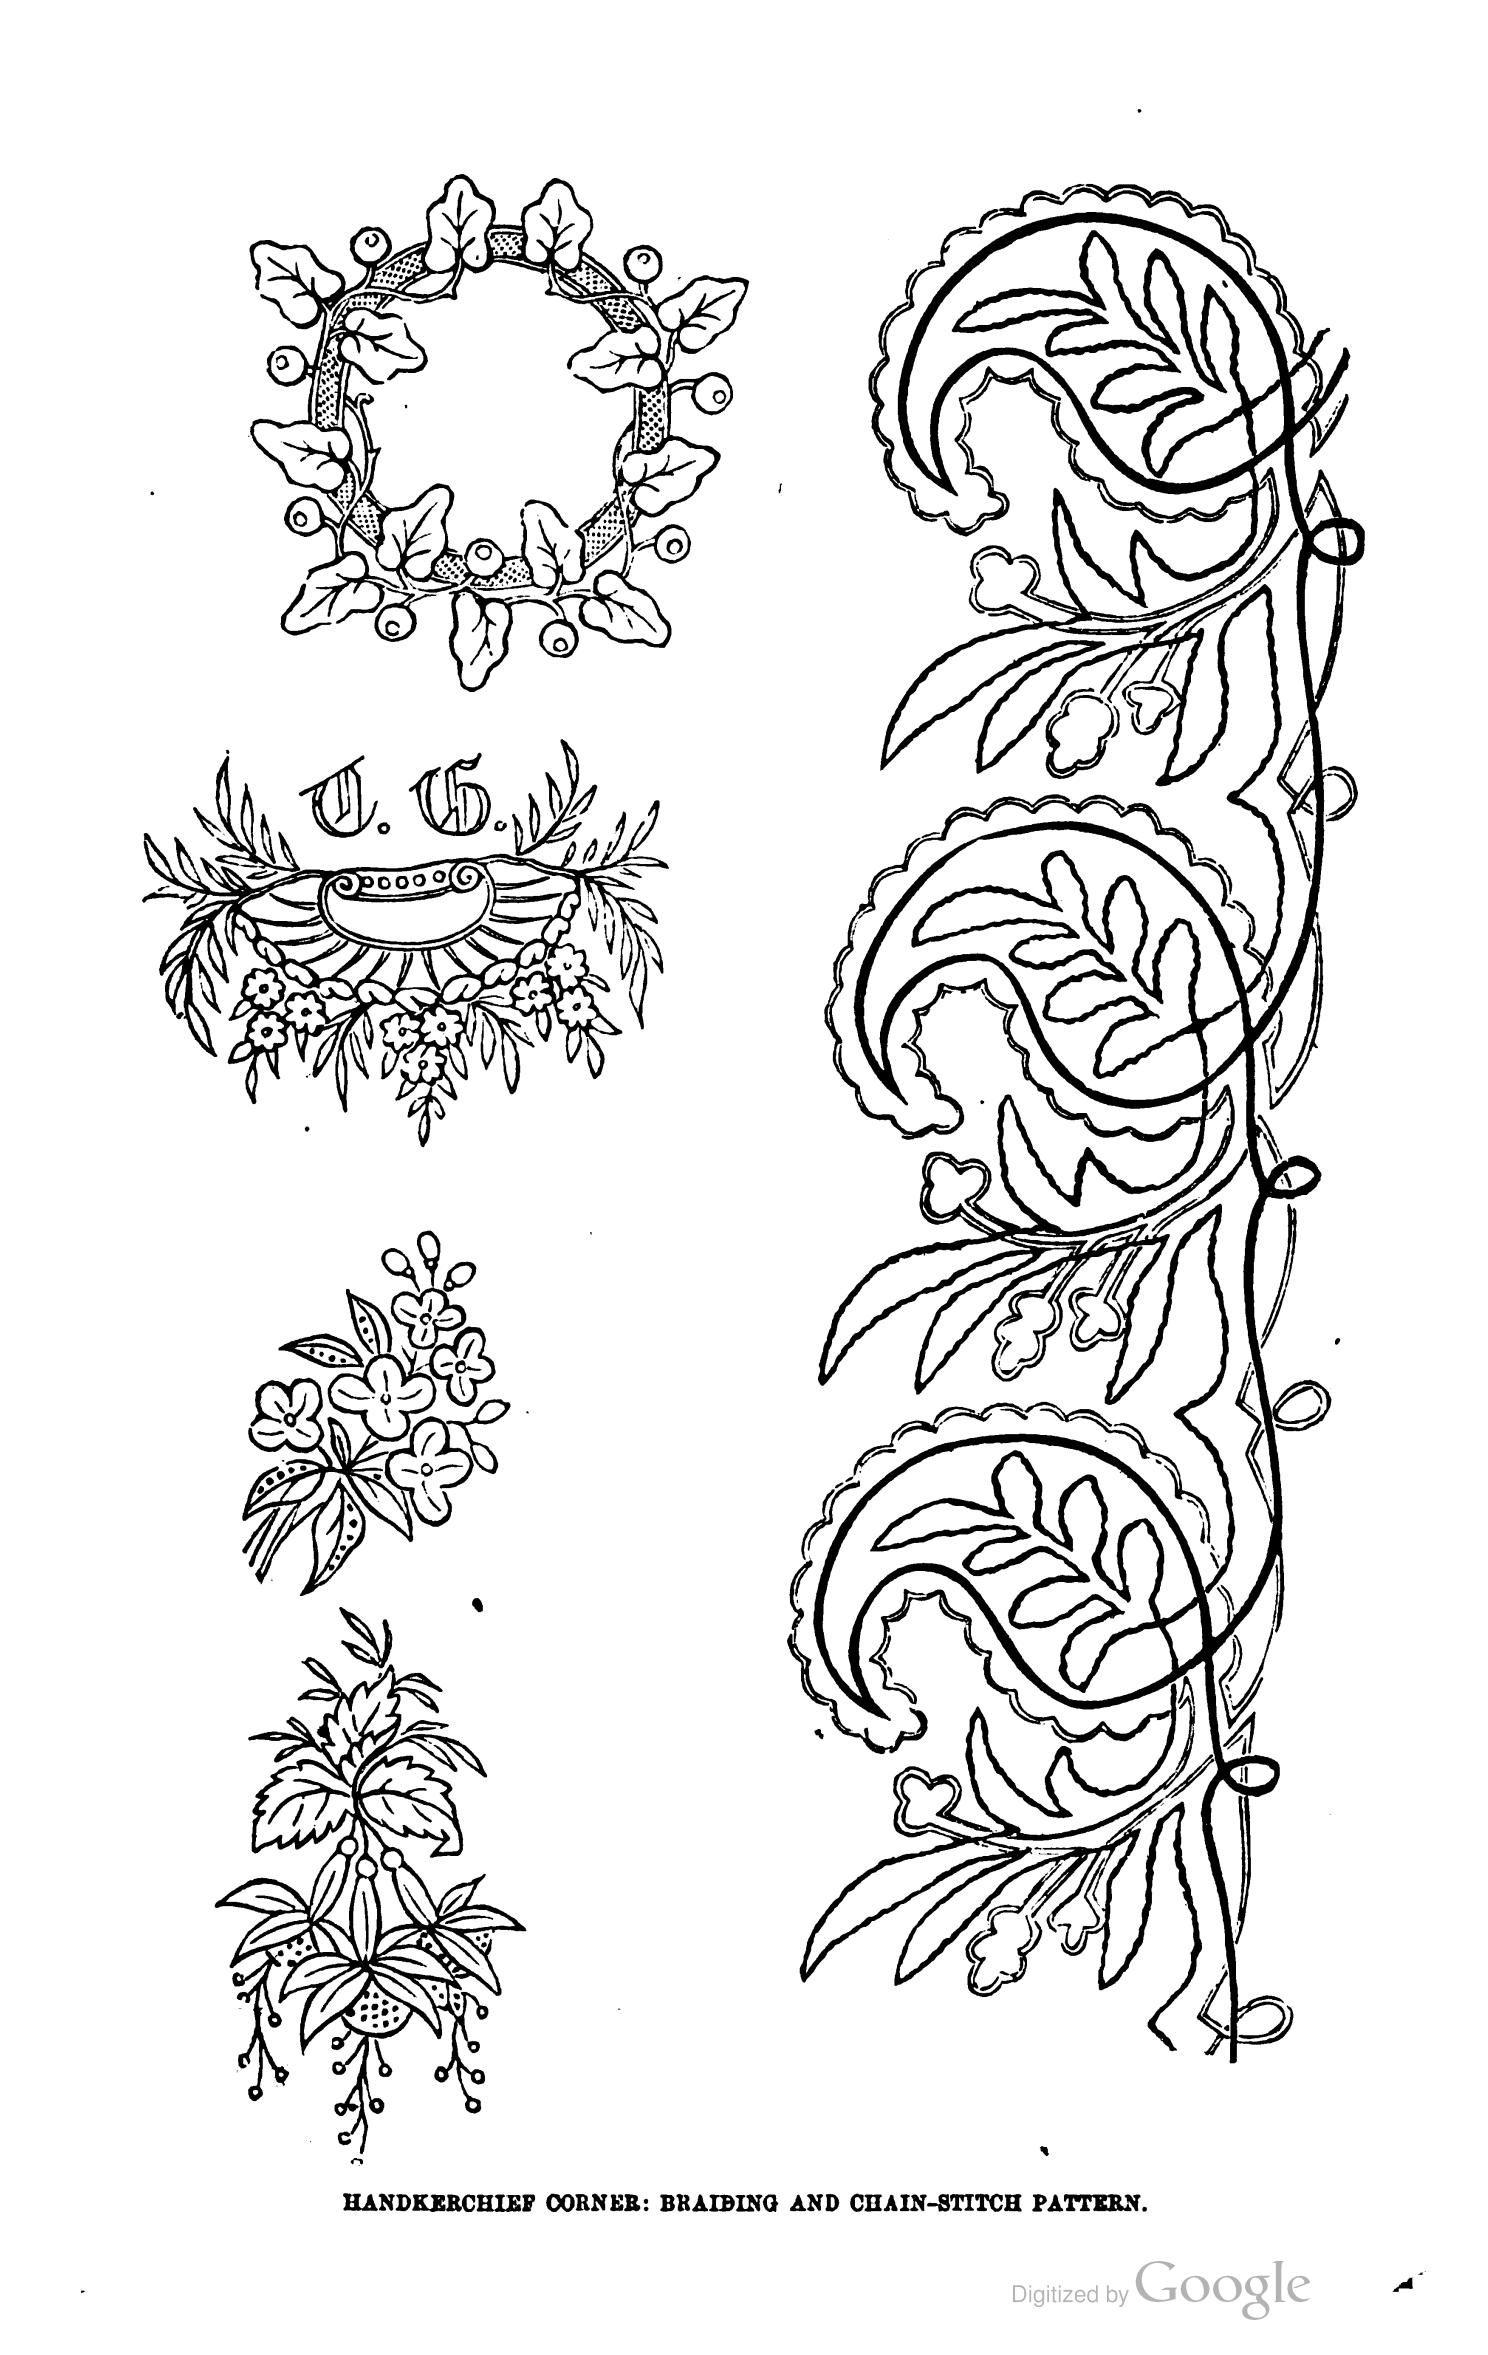 Pin by Nüket Ayok on Nakış desenleri | Pinterest | Embroidery ...